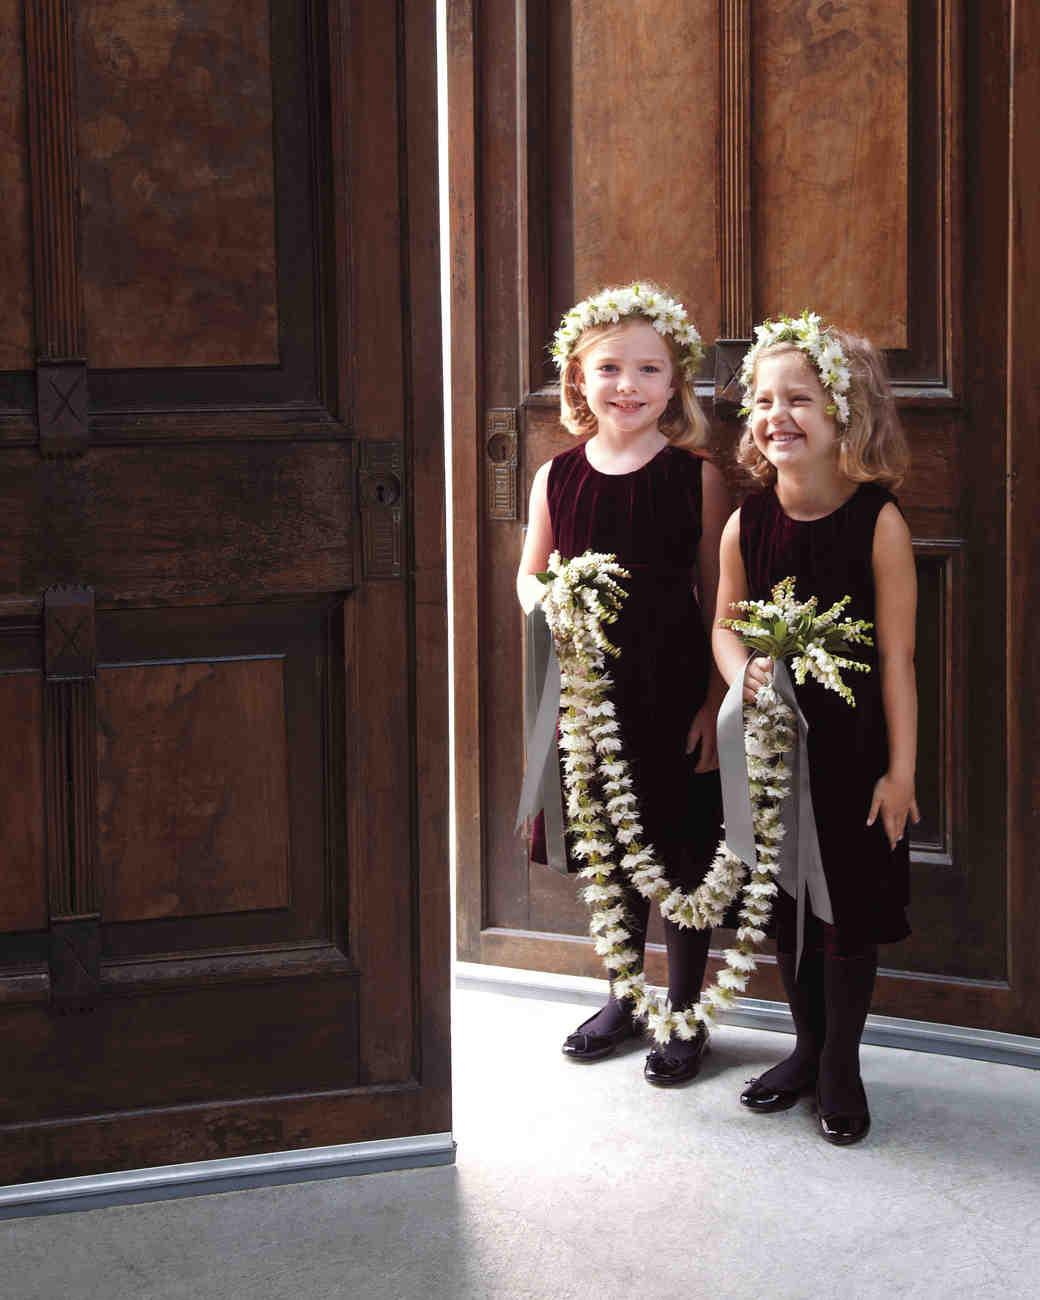 flower-girls-mwd109254.jpg